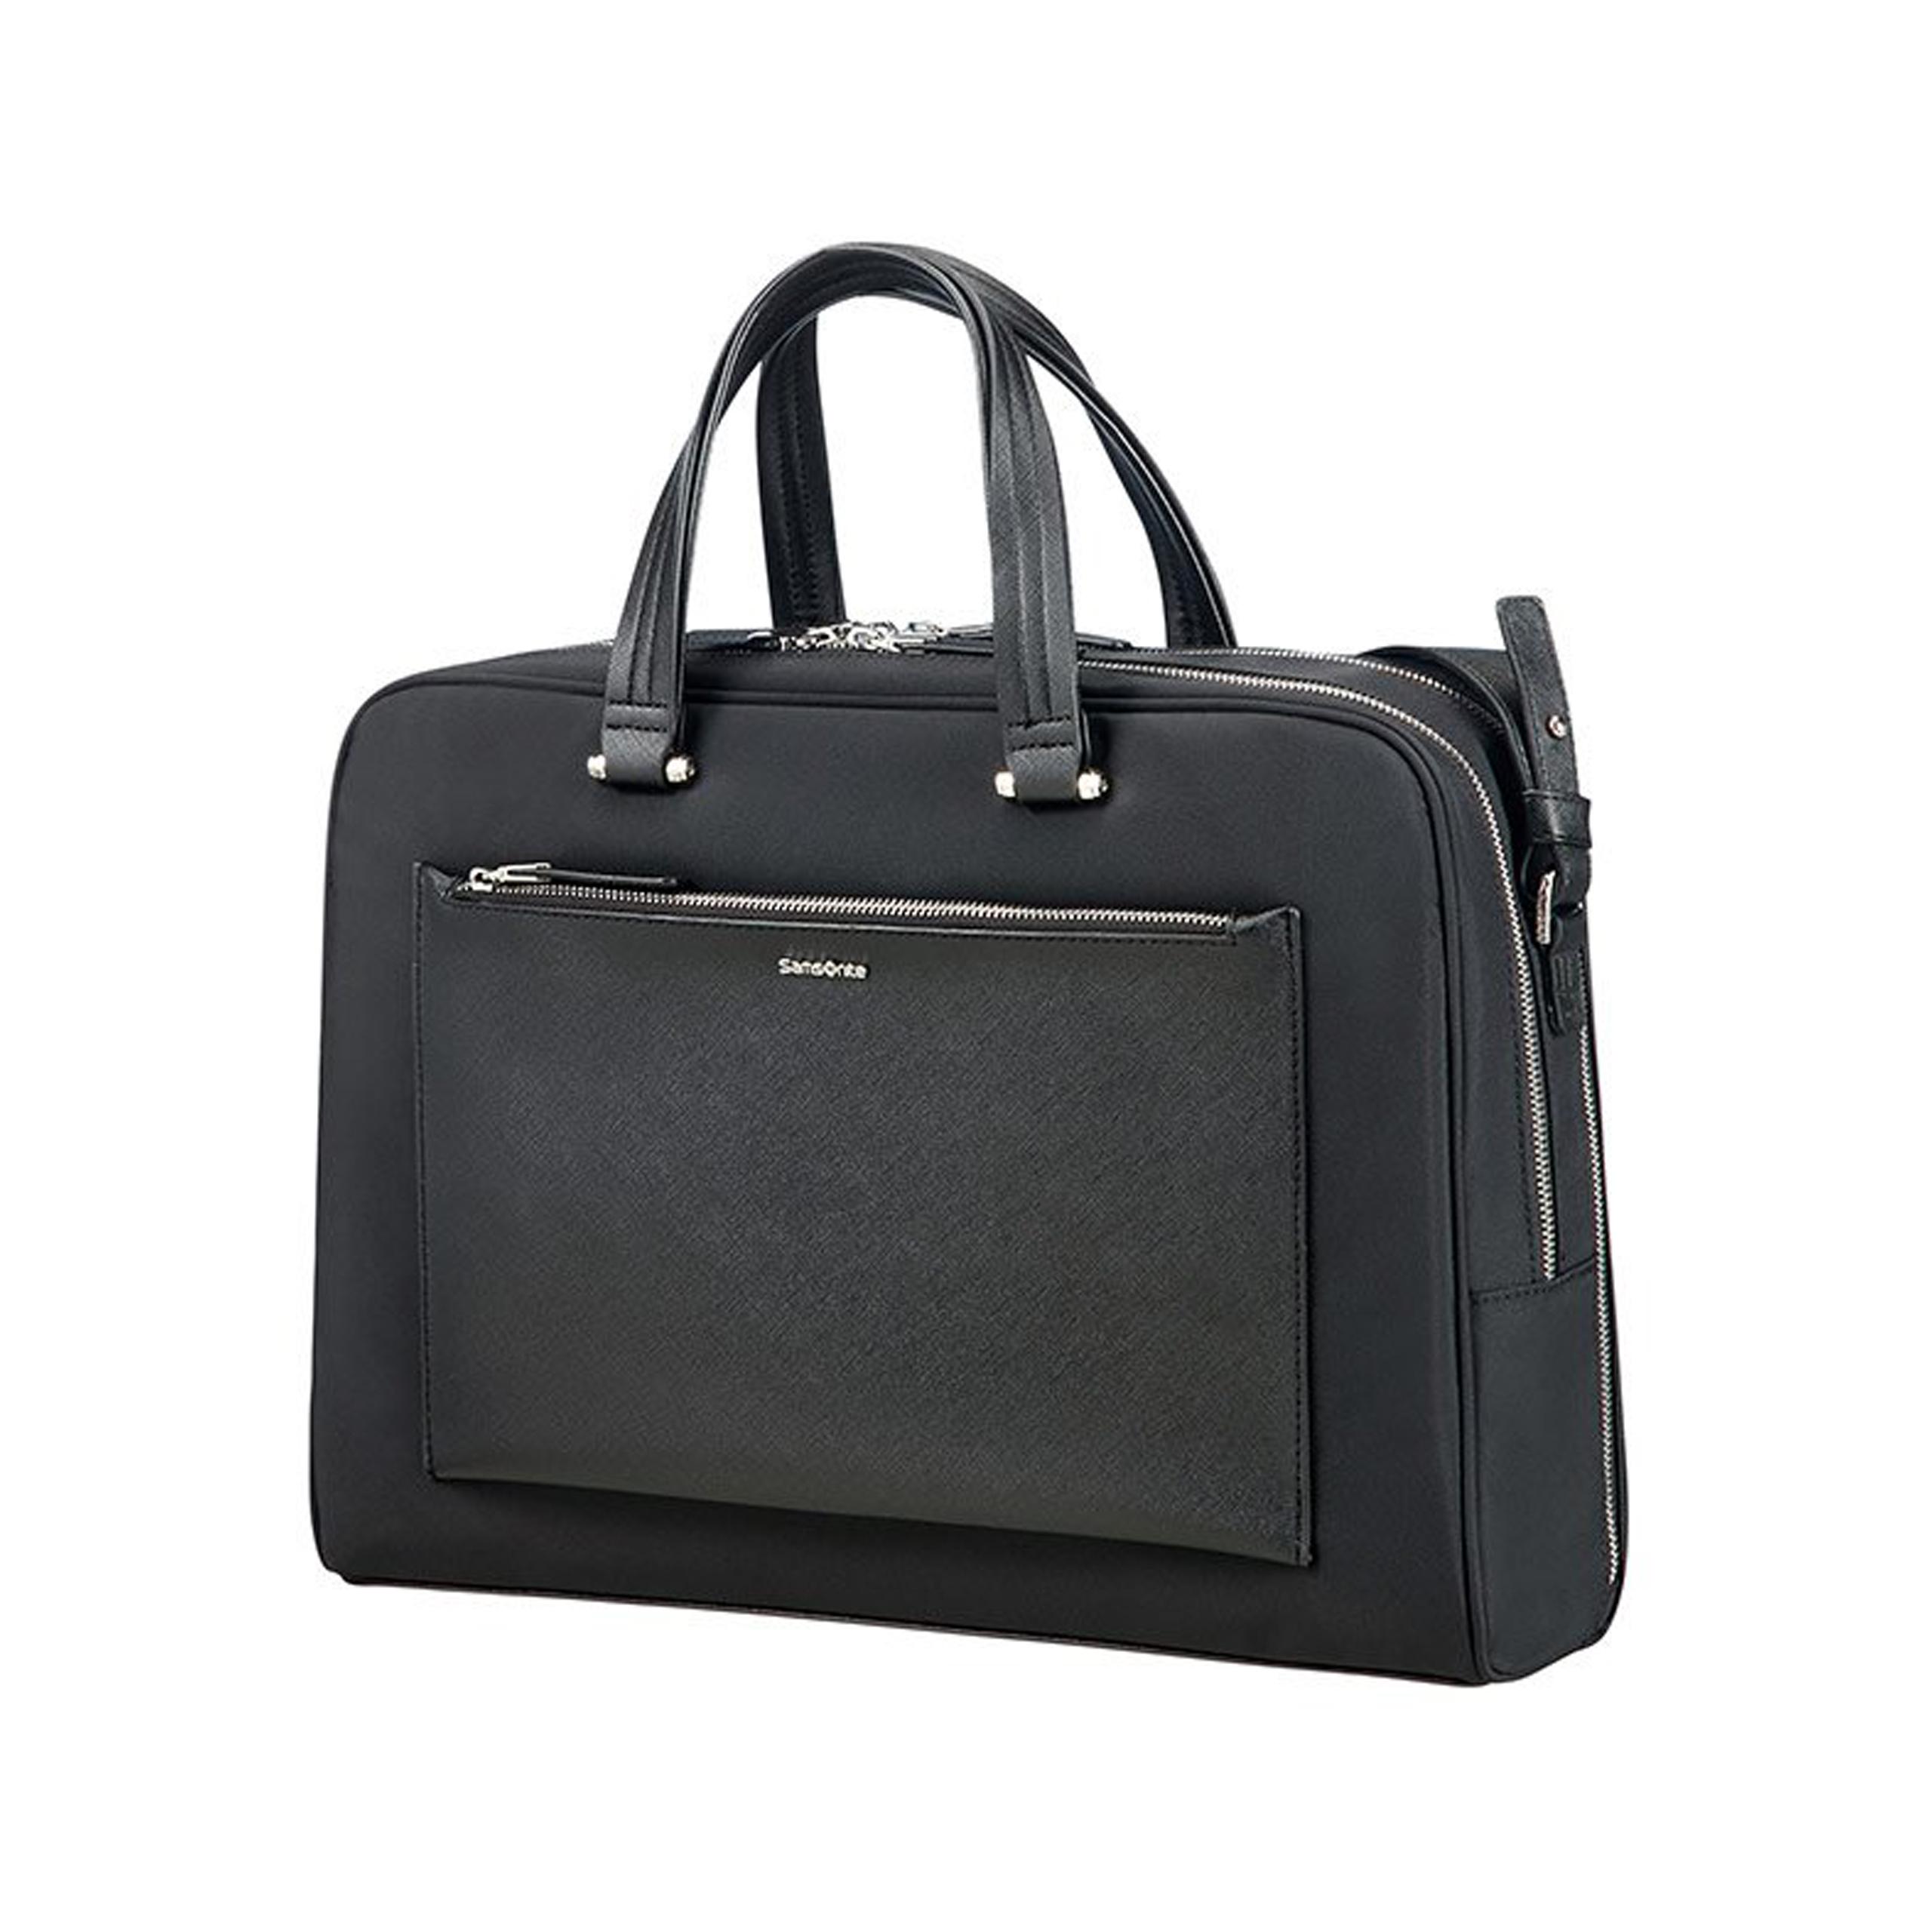 3f15fc0e66cc9 New Line - Torba na laptop 15,6'' Samsonite Zalia 85D 09 005 czarna ...